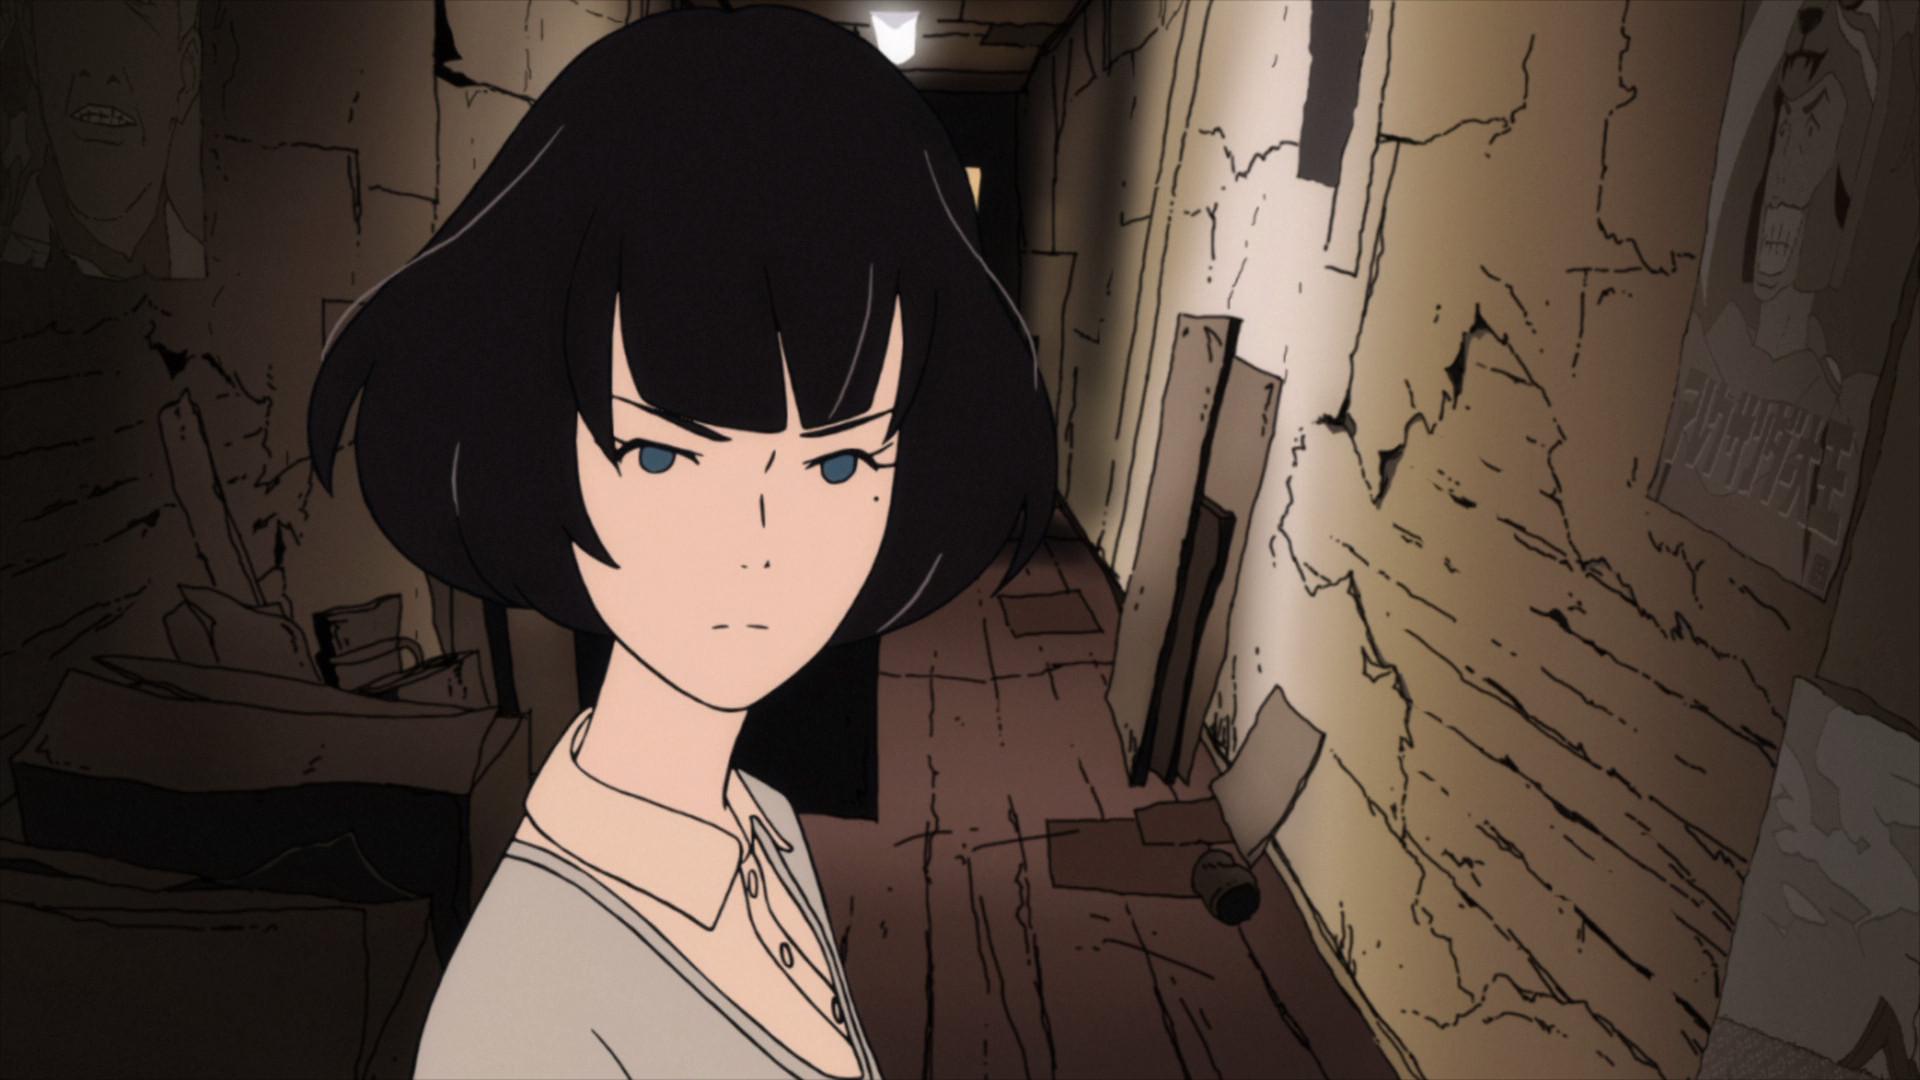 Anime The Tatami Galaxy Akashi anime Yojouhan Shinwa Taikei